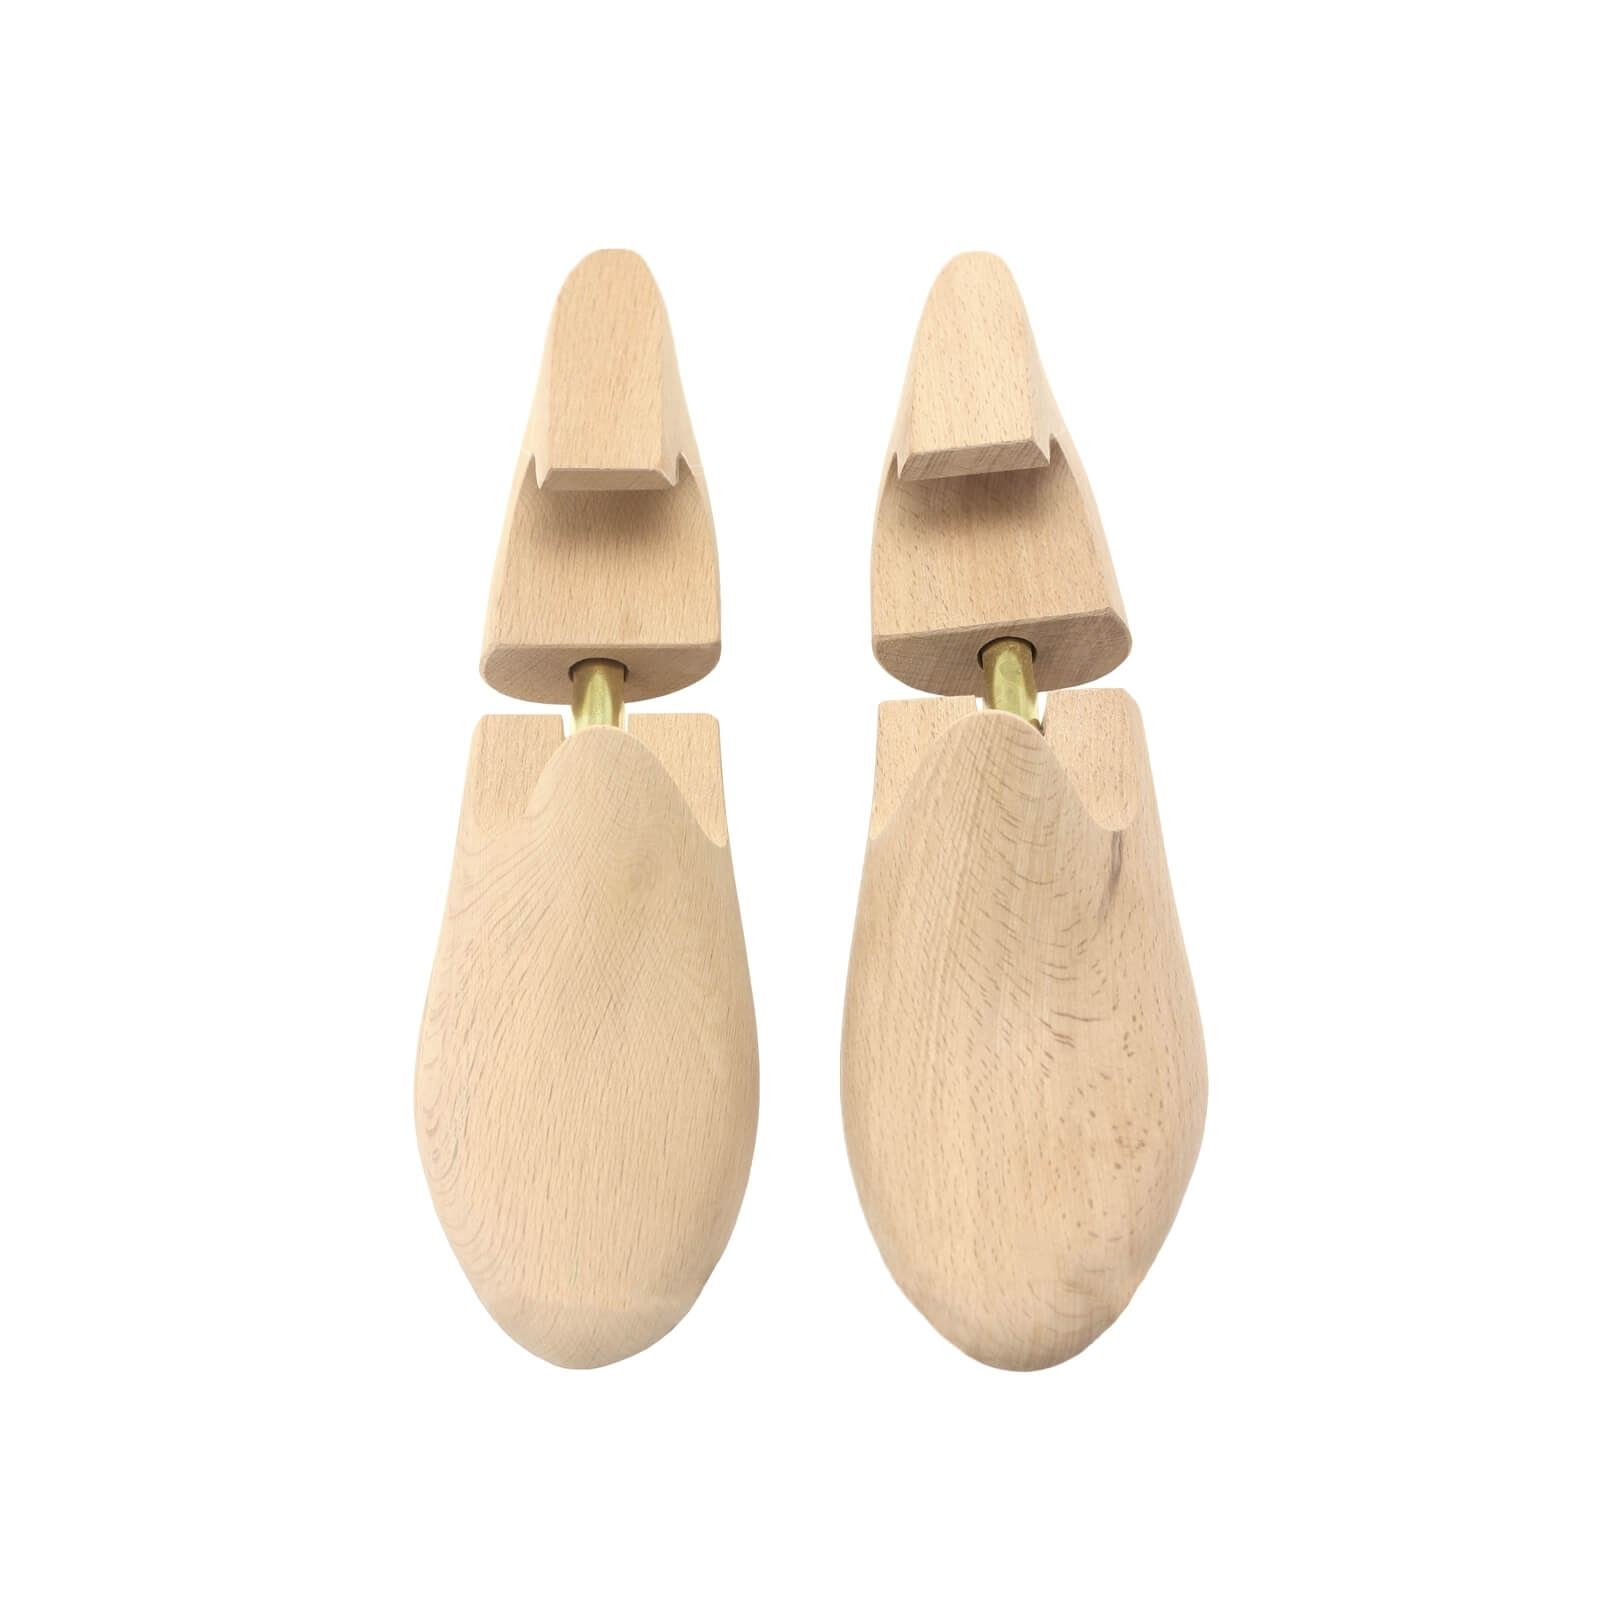 wooden high heel shoe trees for